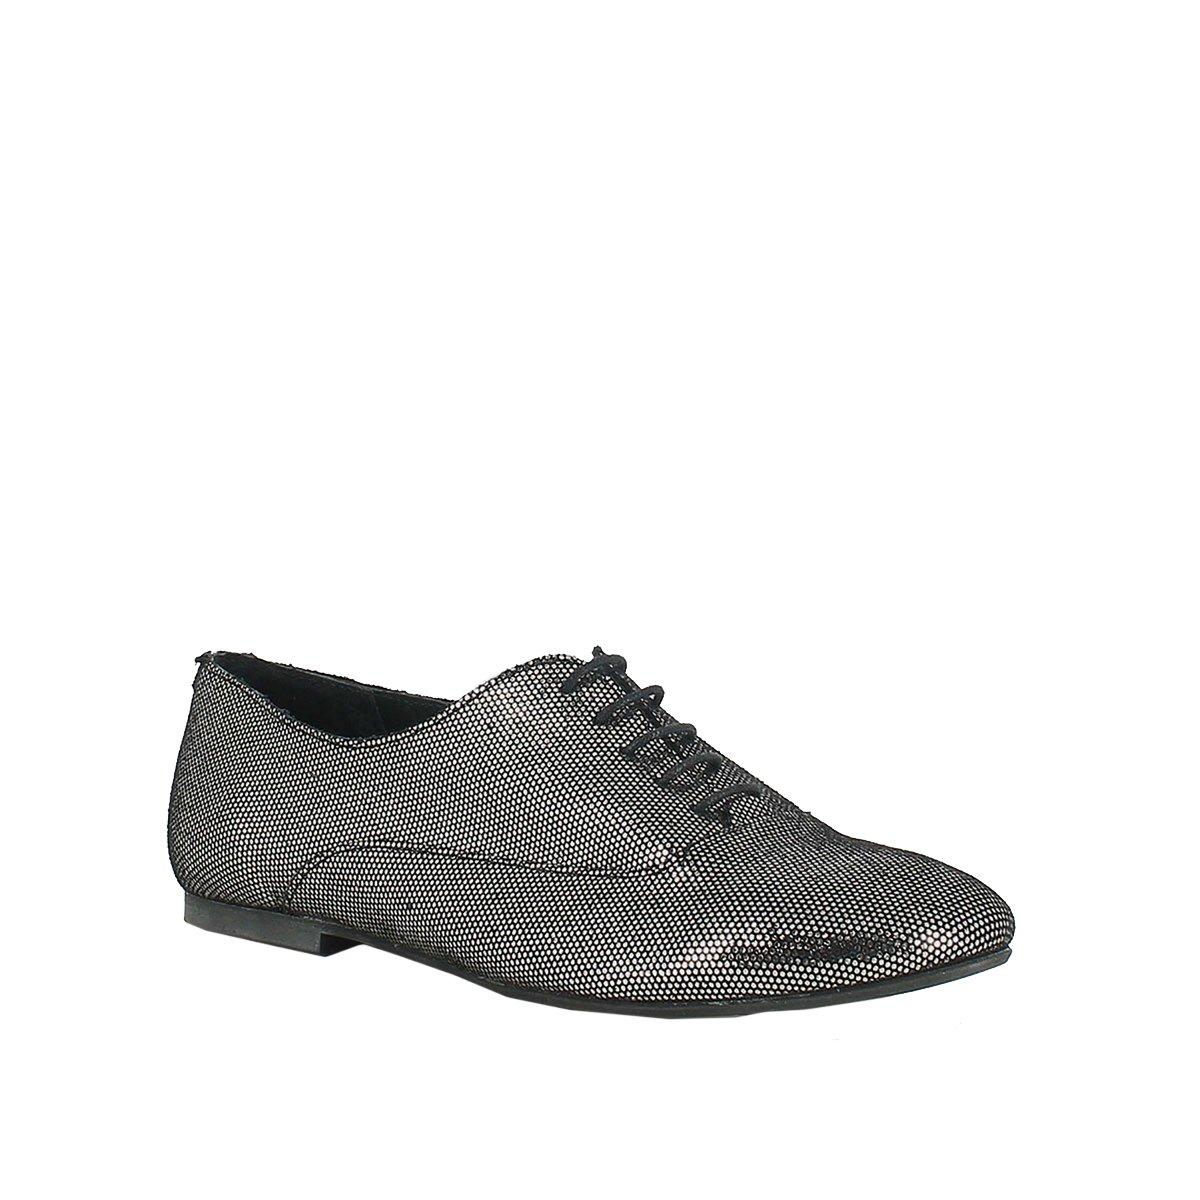 JONAK Womens Metallic Leather Brogues Grey Size 39 (5.5 To 6)